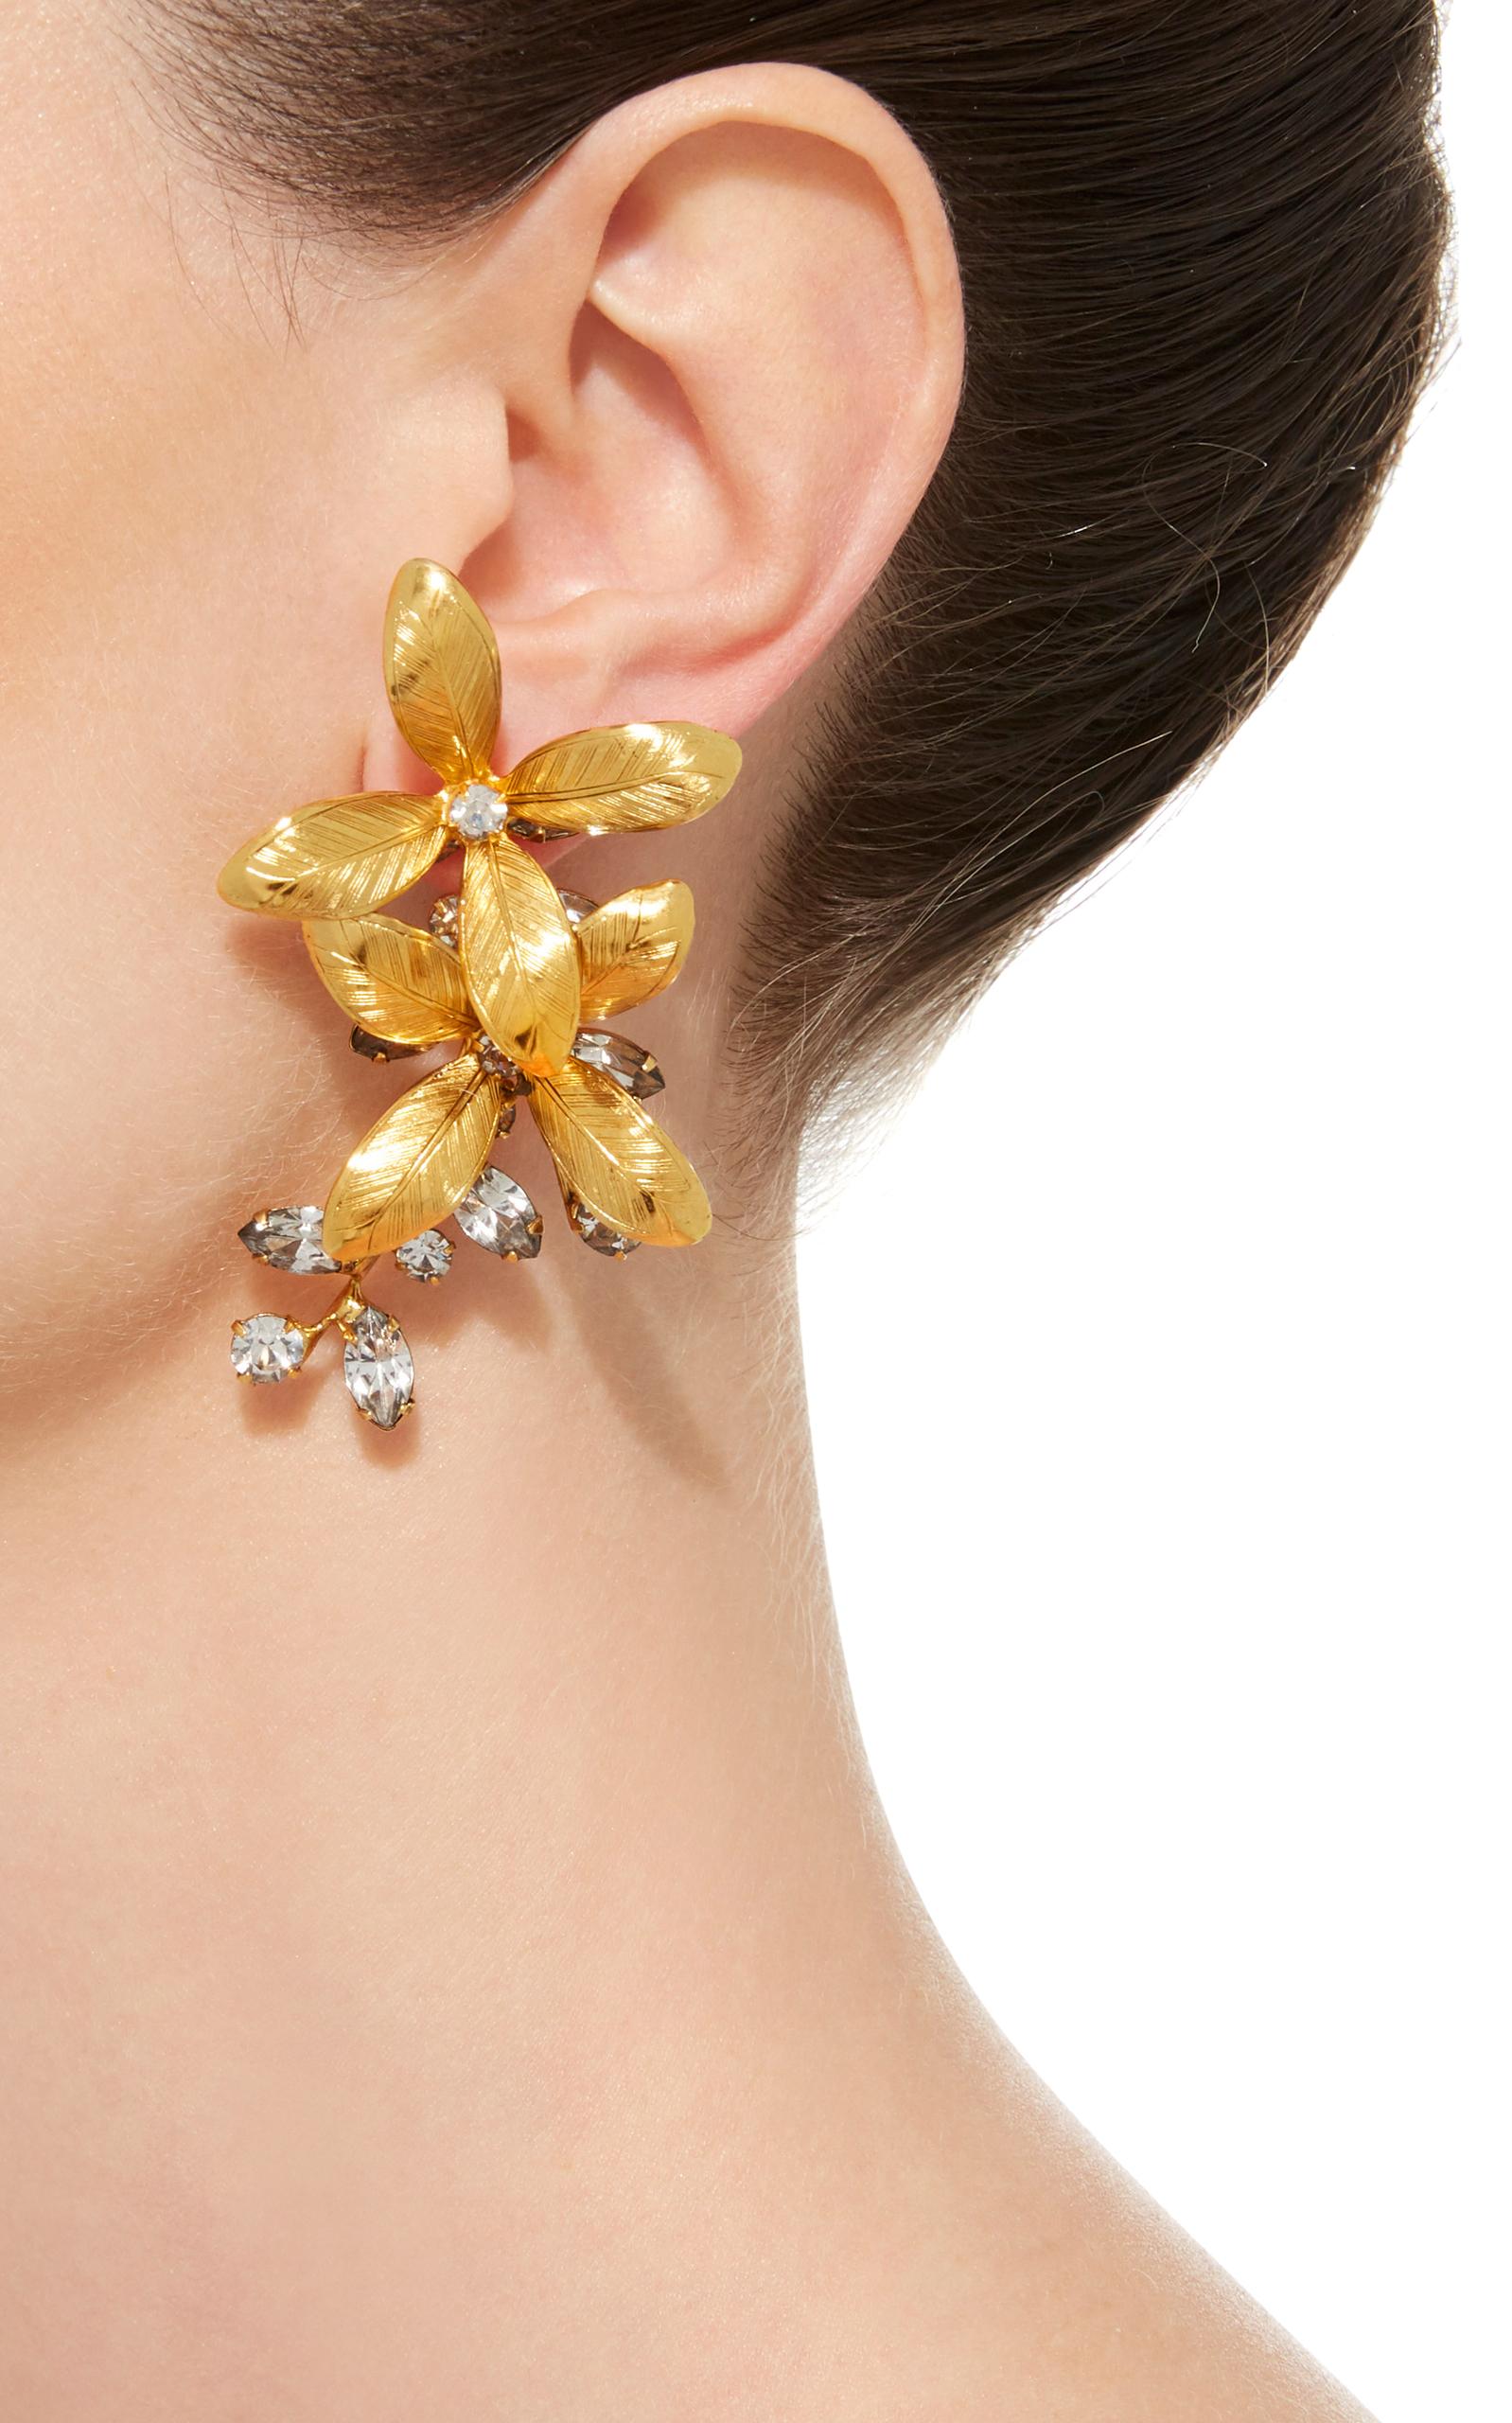 JEWELLERY - Necklaces Jennifer Behr FeN5v36uj